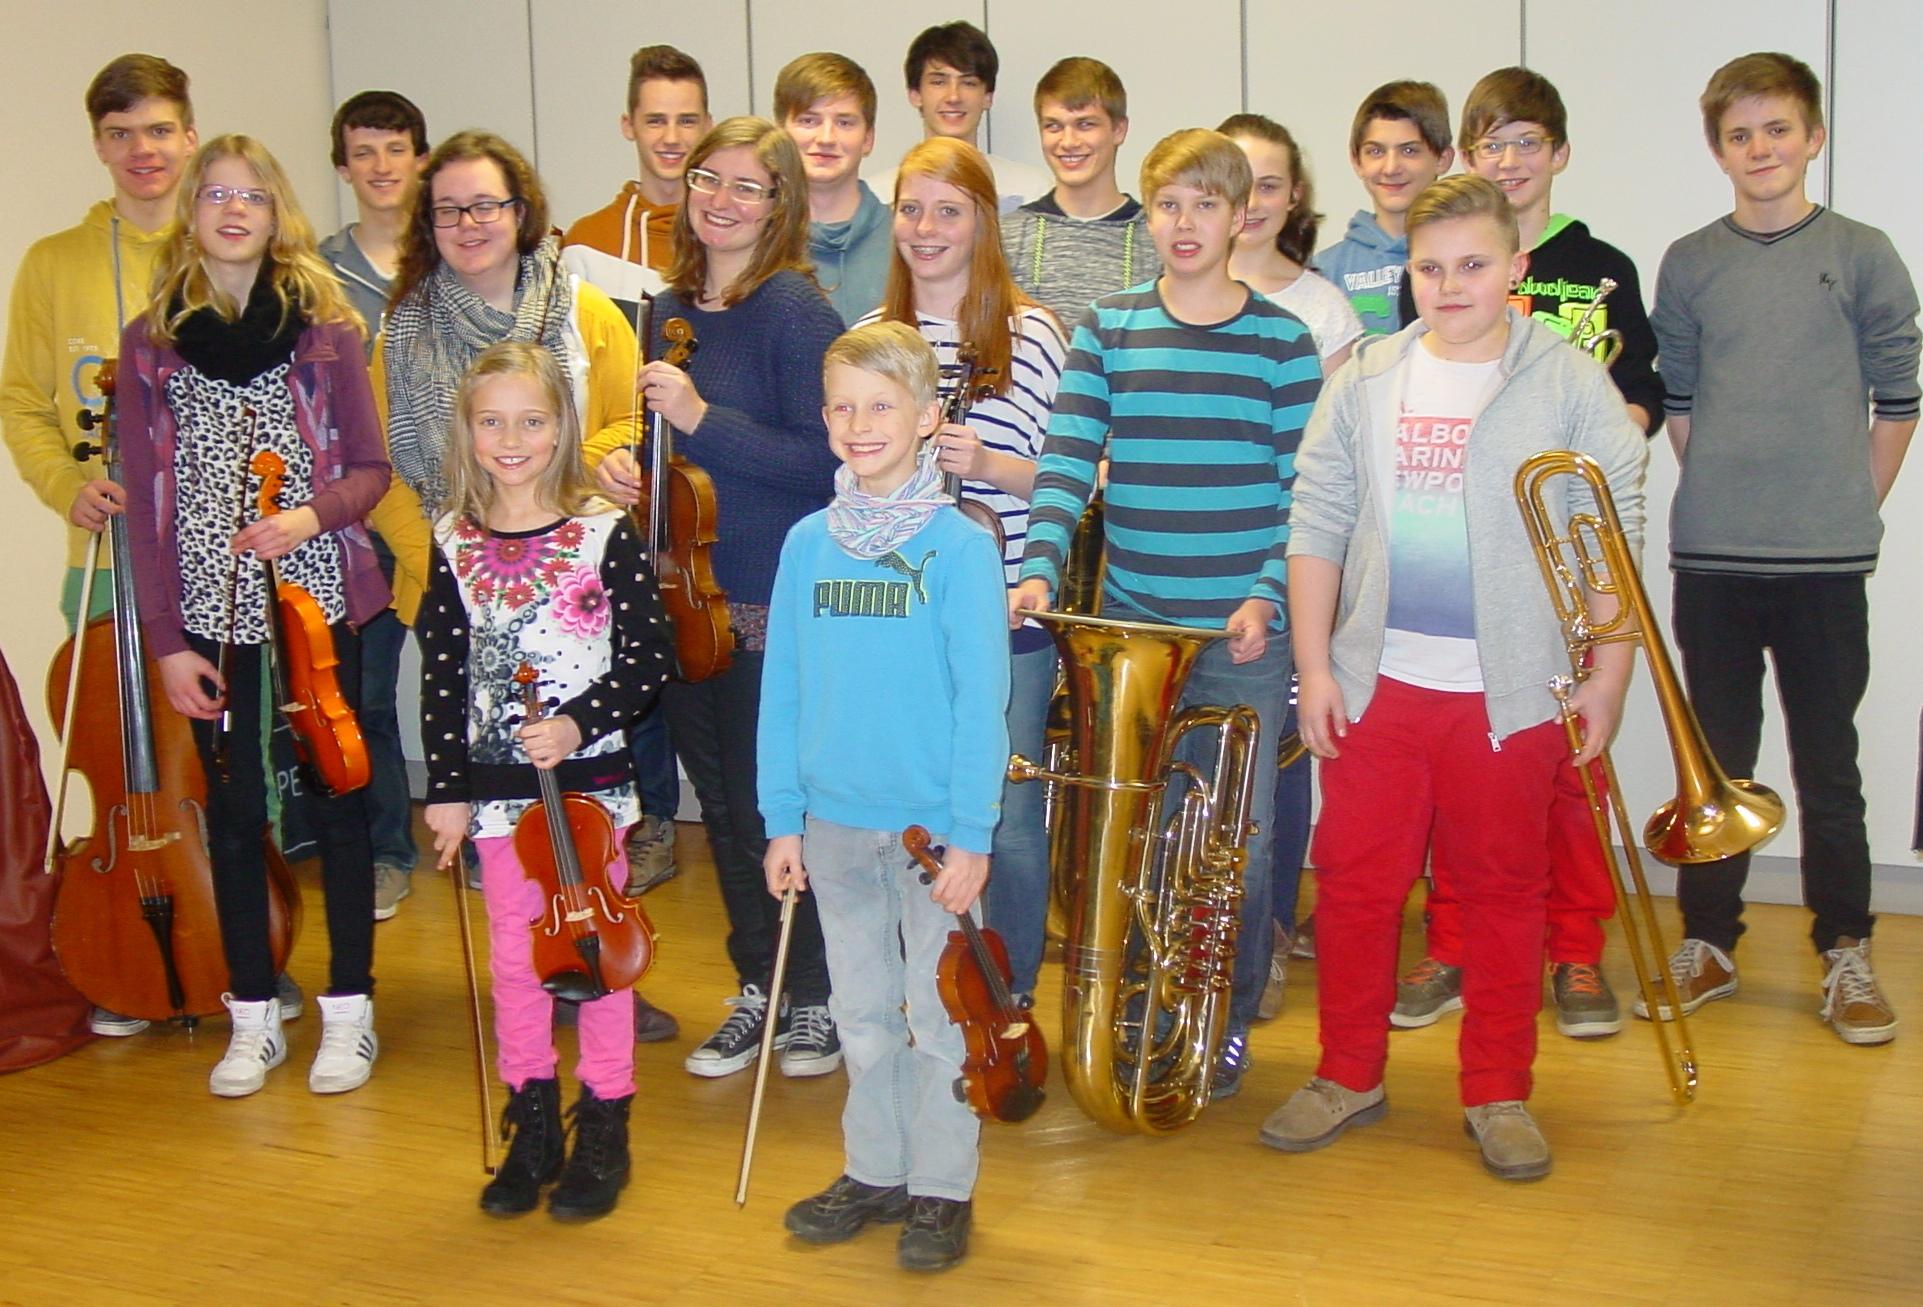 Jugend_musiziert_Regio_14_Musikschule_003